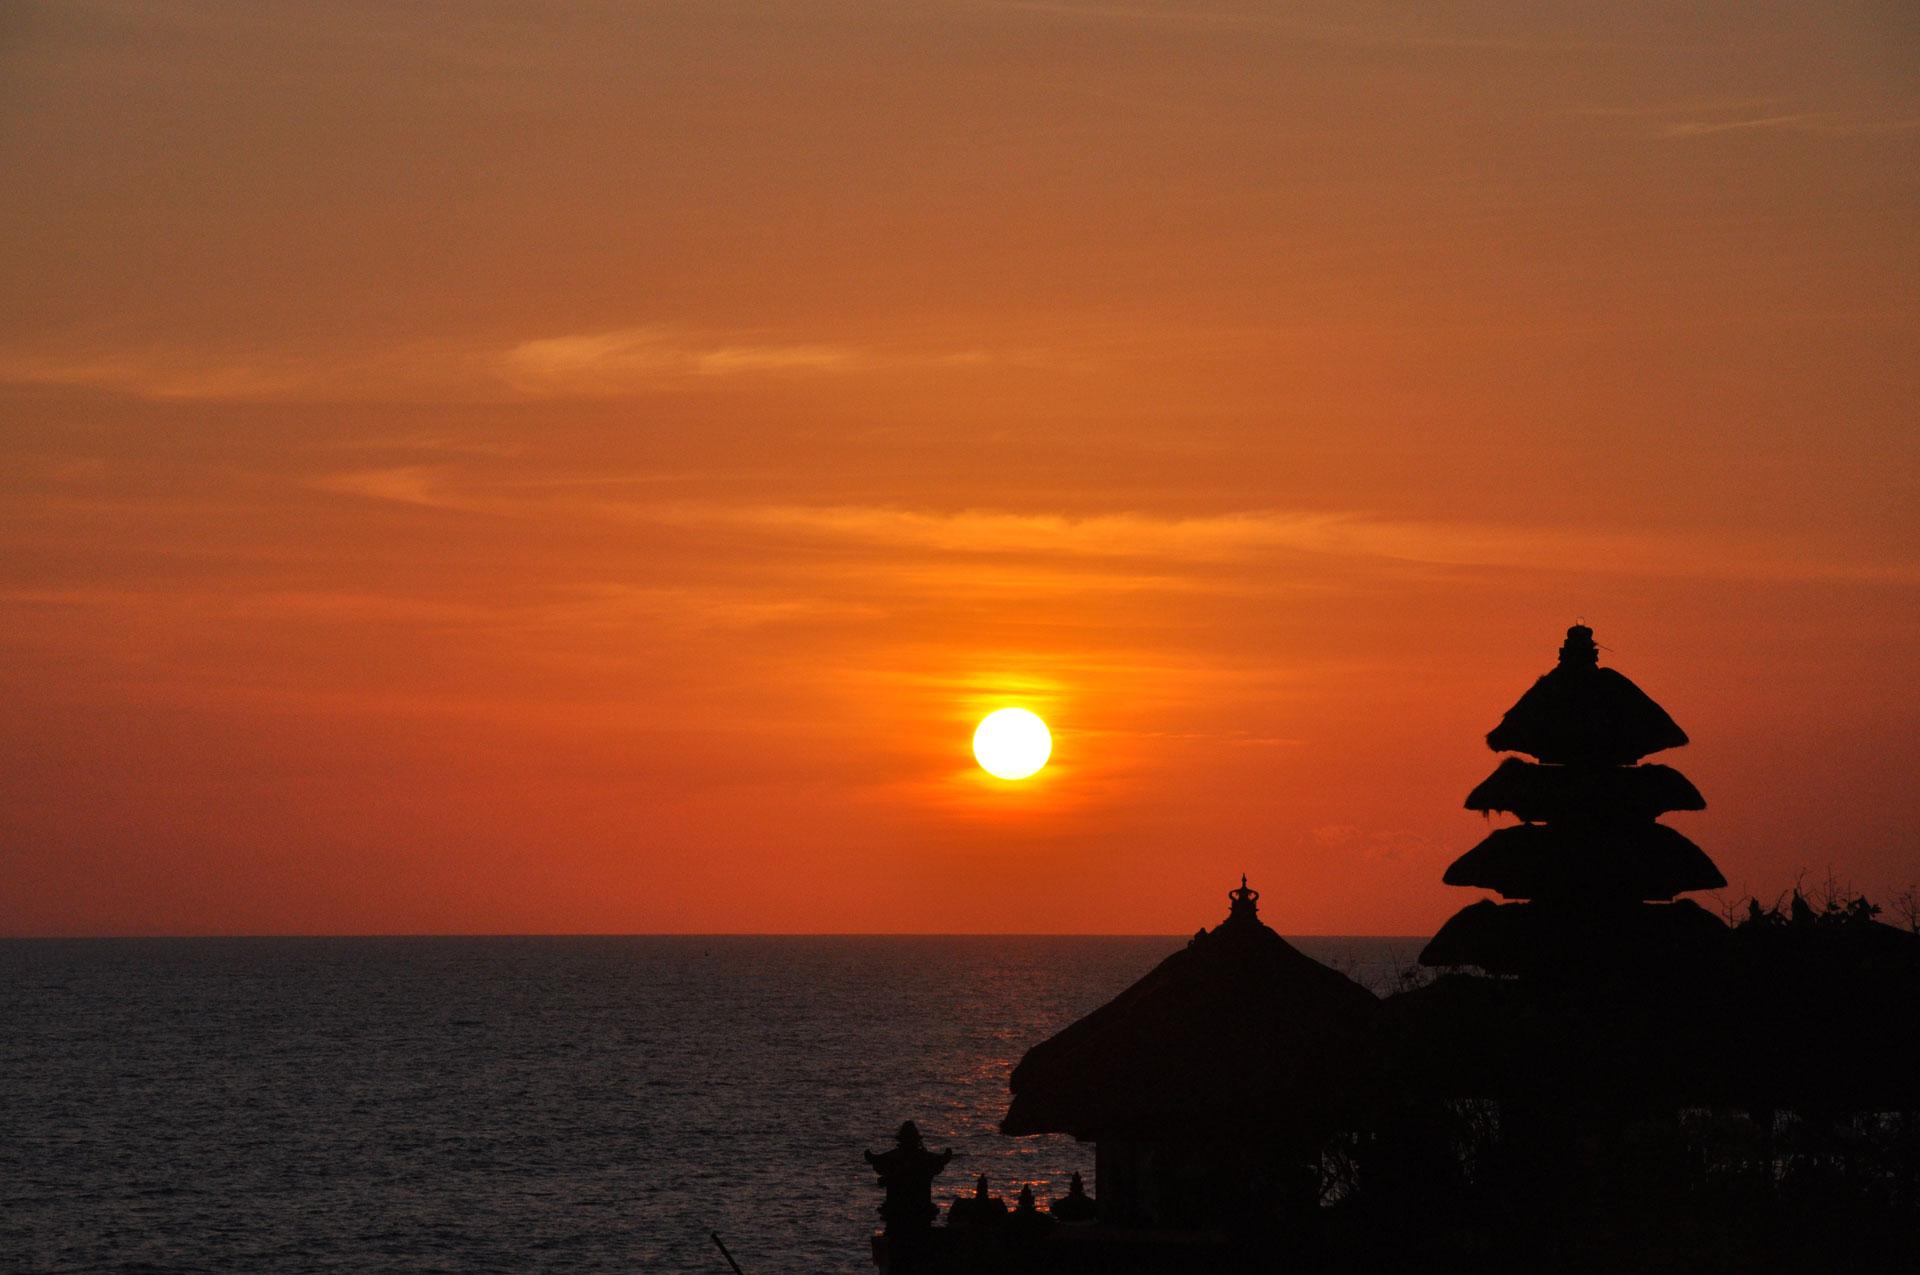 Bali's Culture